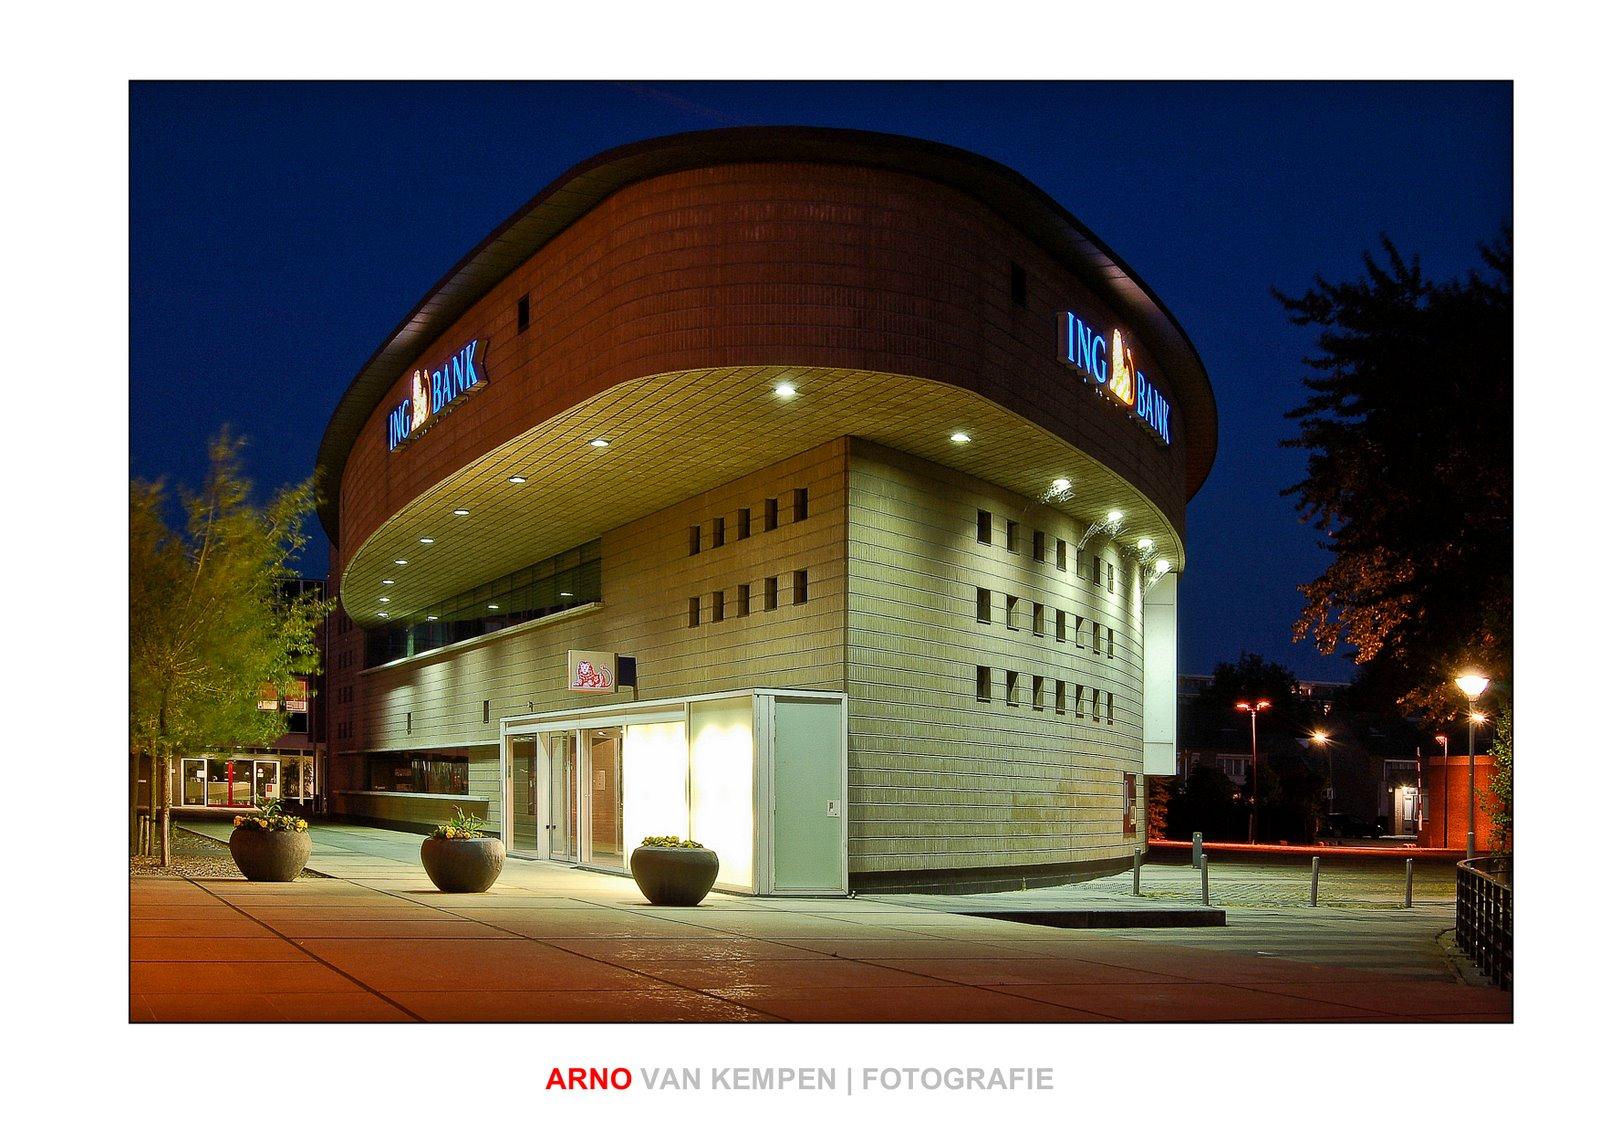 Great ARNO VAN KEMPEN | FOTOGRAFIE 1600 x 1132 · 309 kB · jpeg